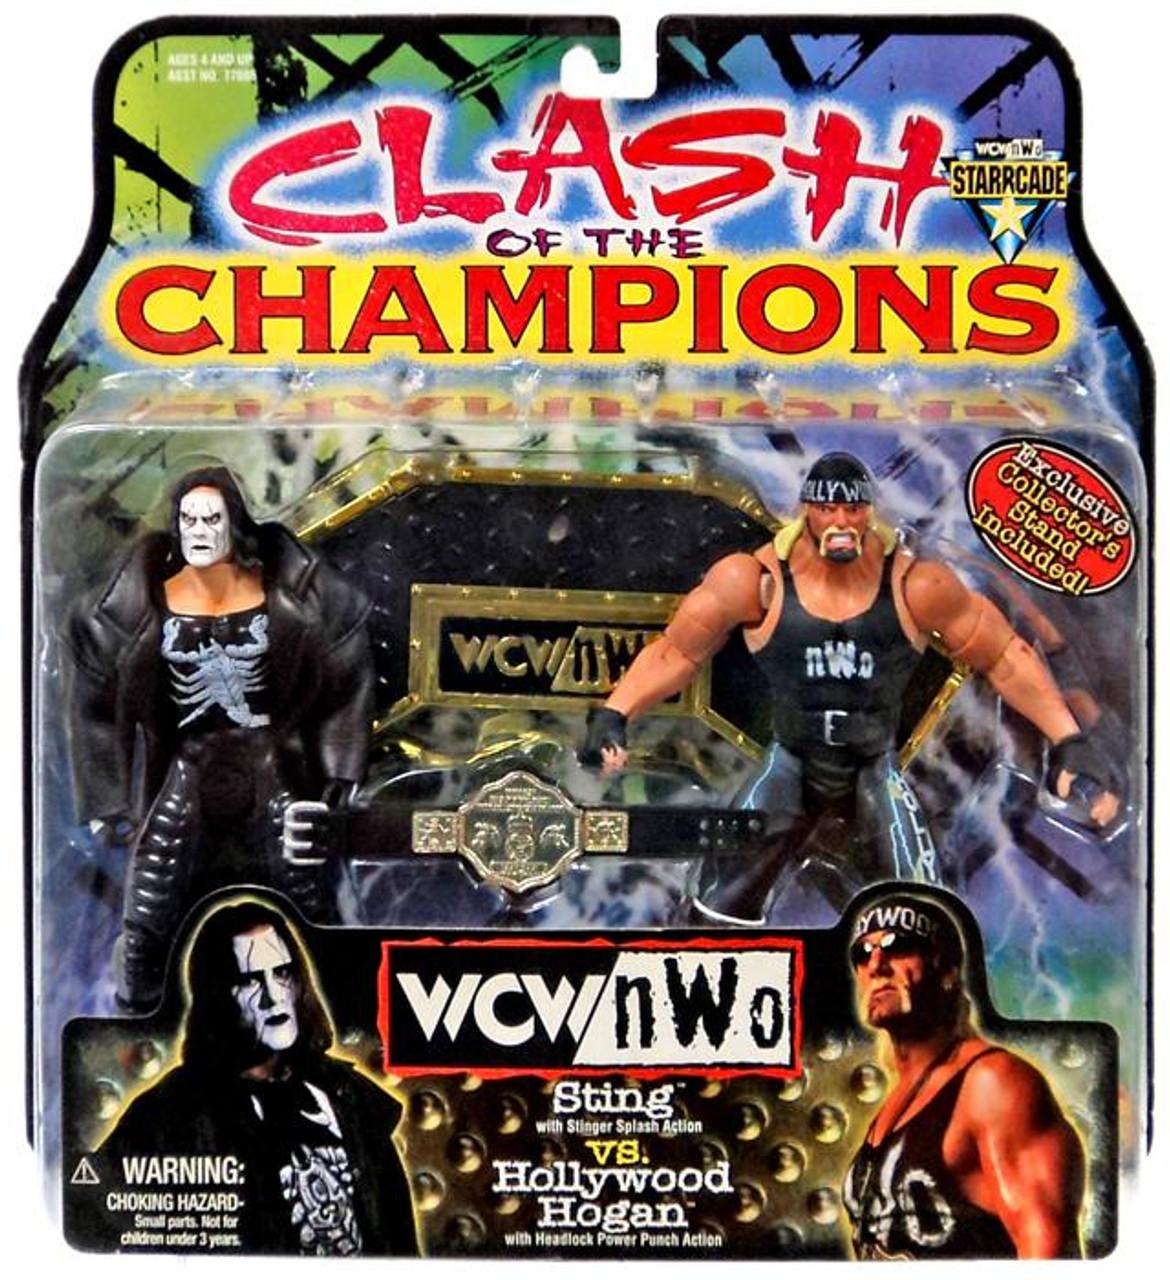 Wwe Wrestling Nwo Clash Of The Champions Sting Vs